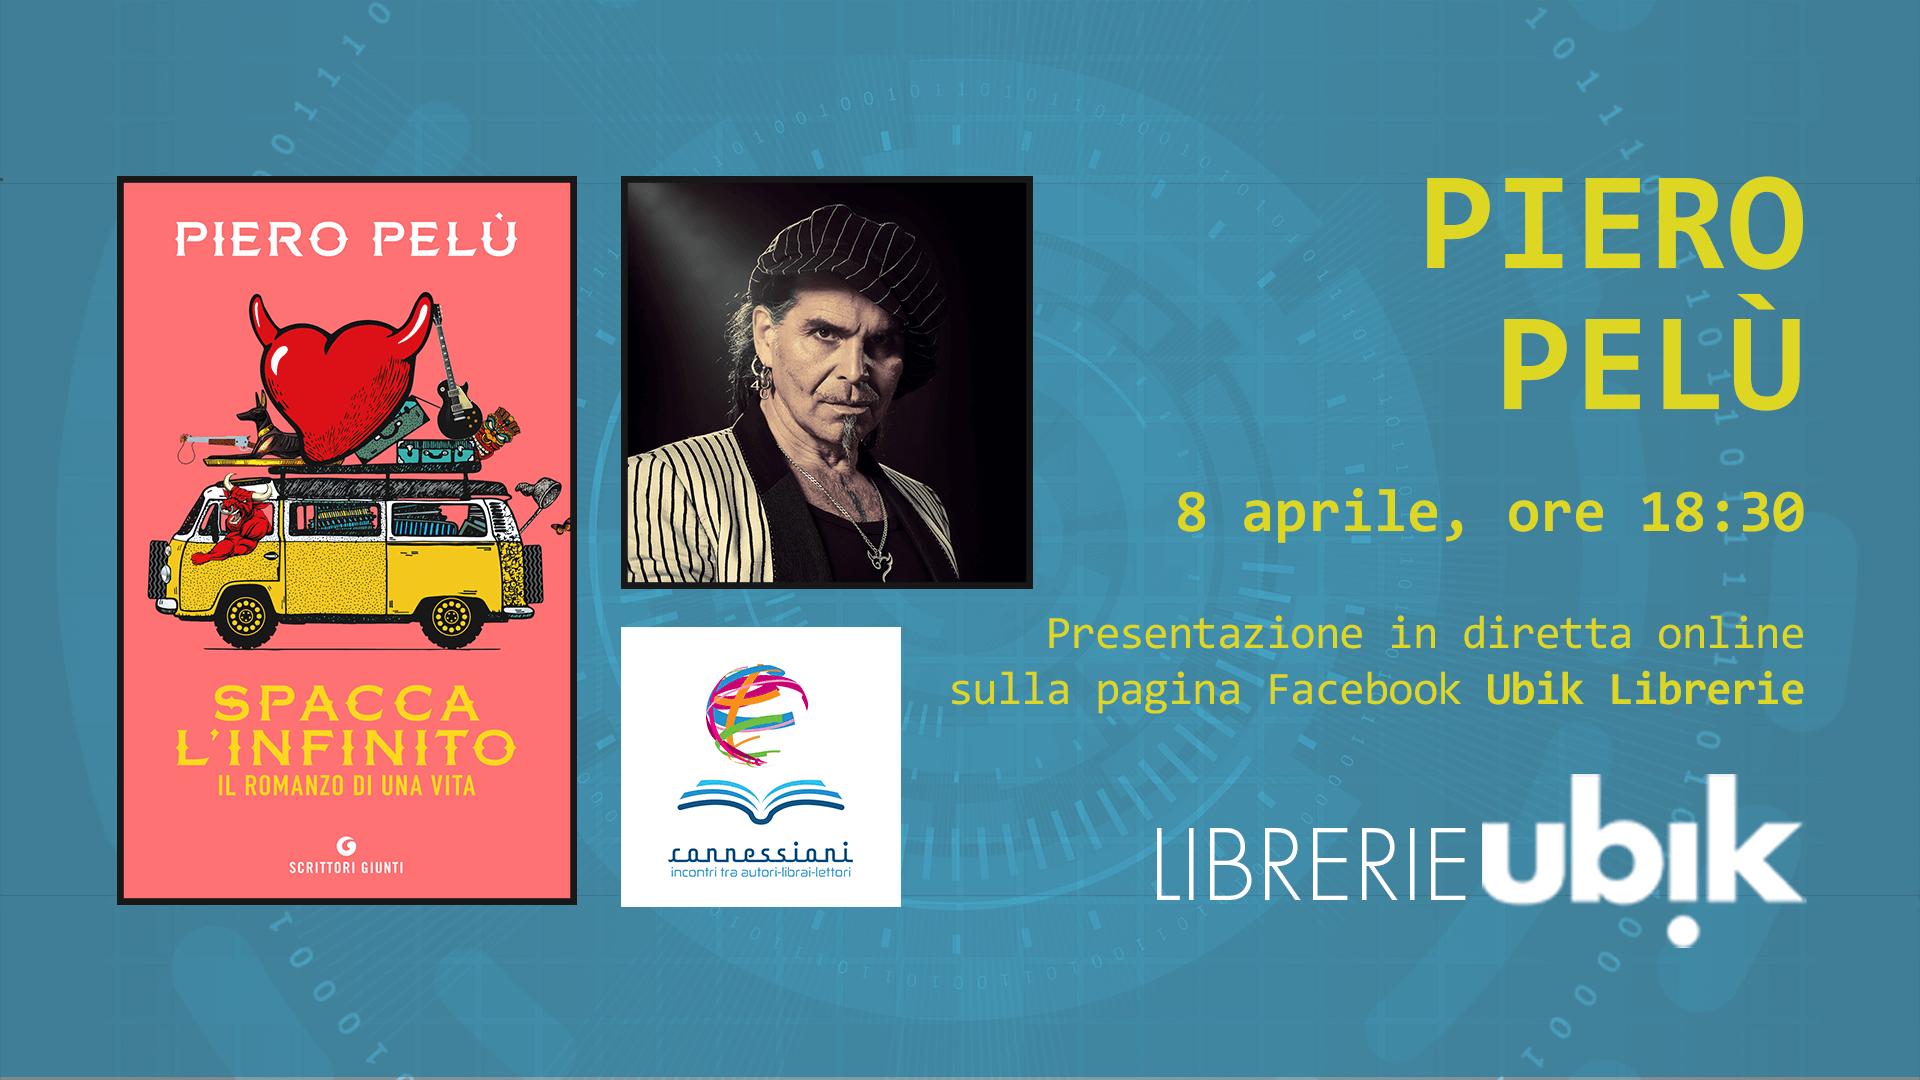 PIERO PELÙ presenta in diretta online